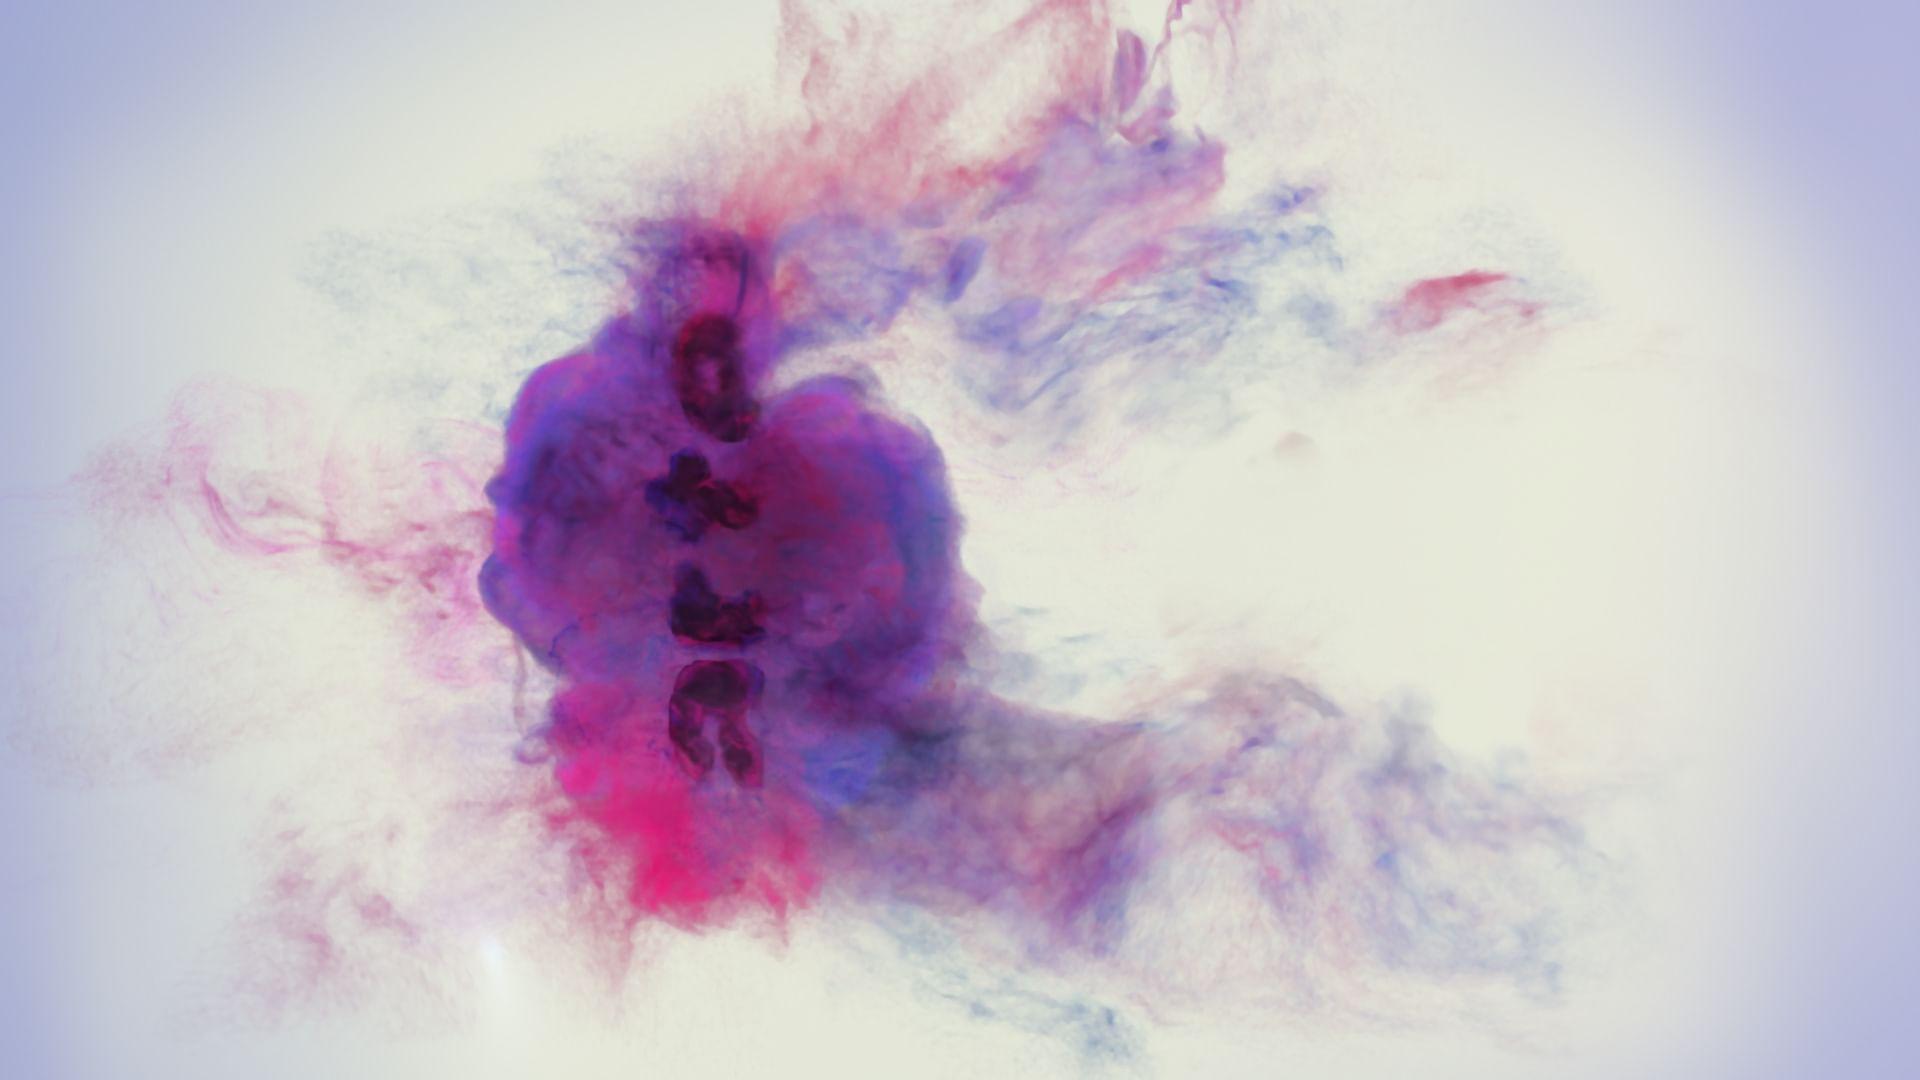 Apple Le 3eme Homme